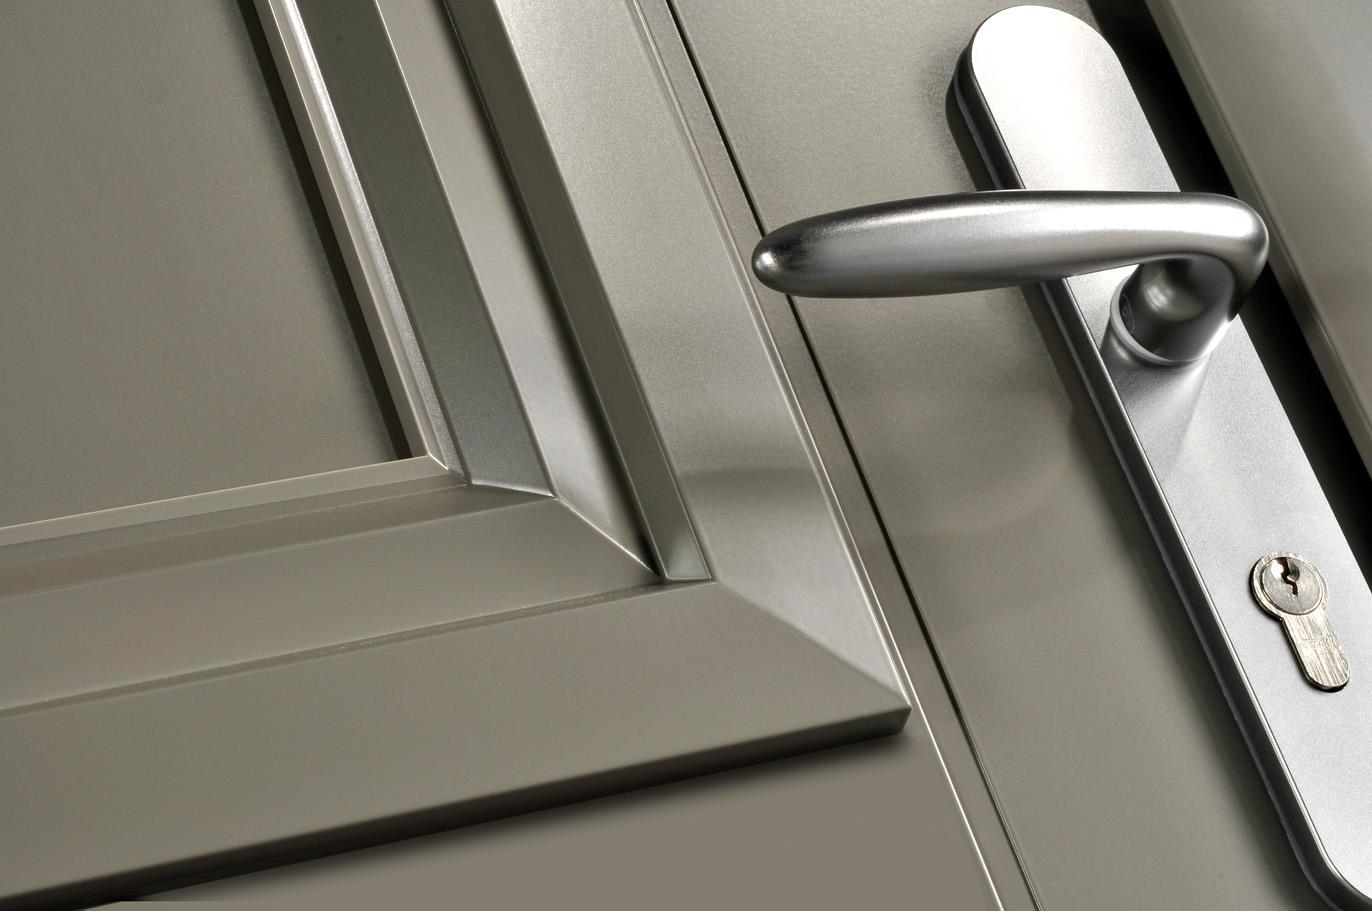 Portes d 39 entr e aluminium merlin swao for Poignee porte d entree exterieure